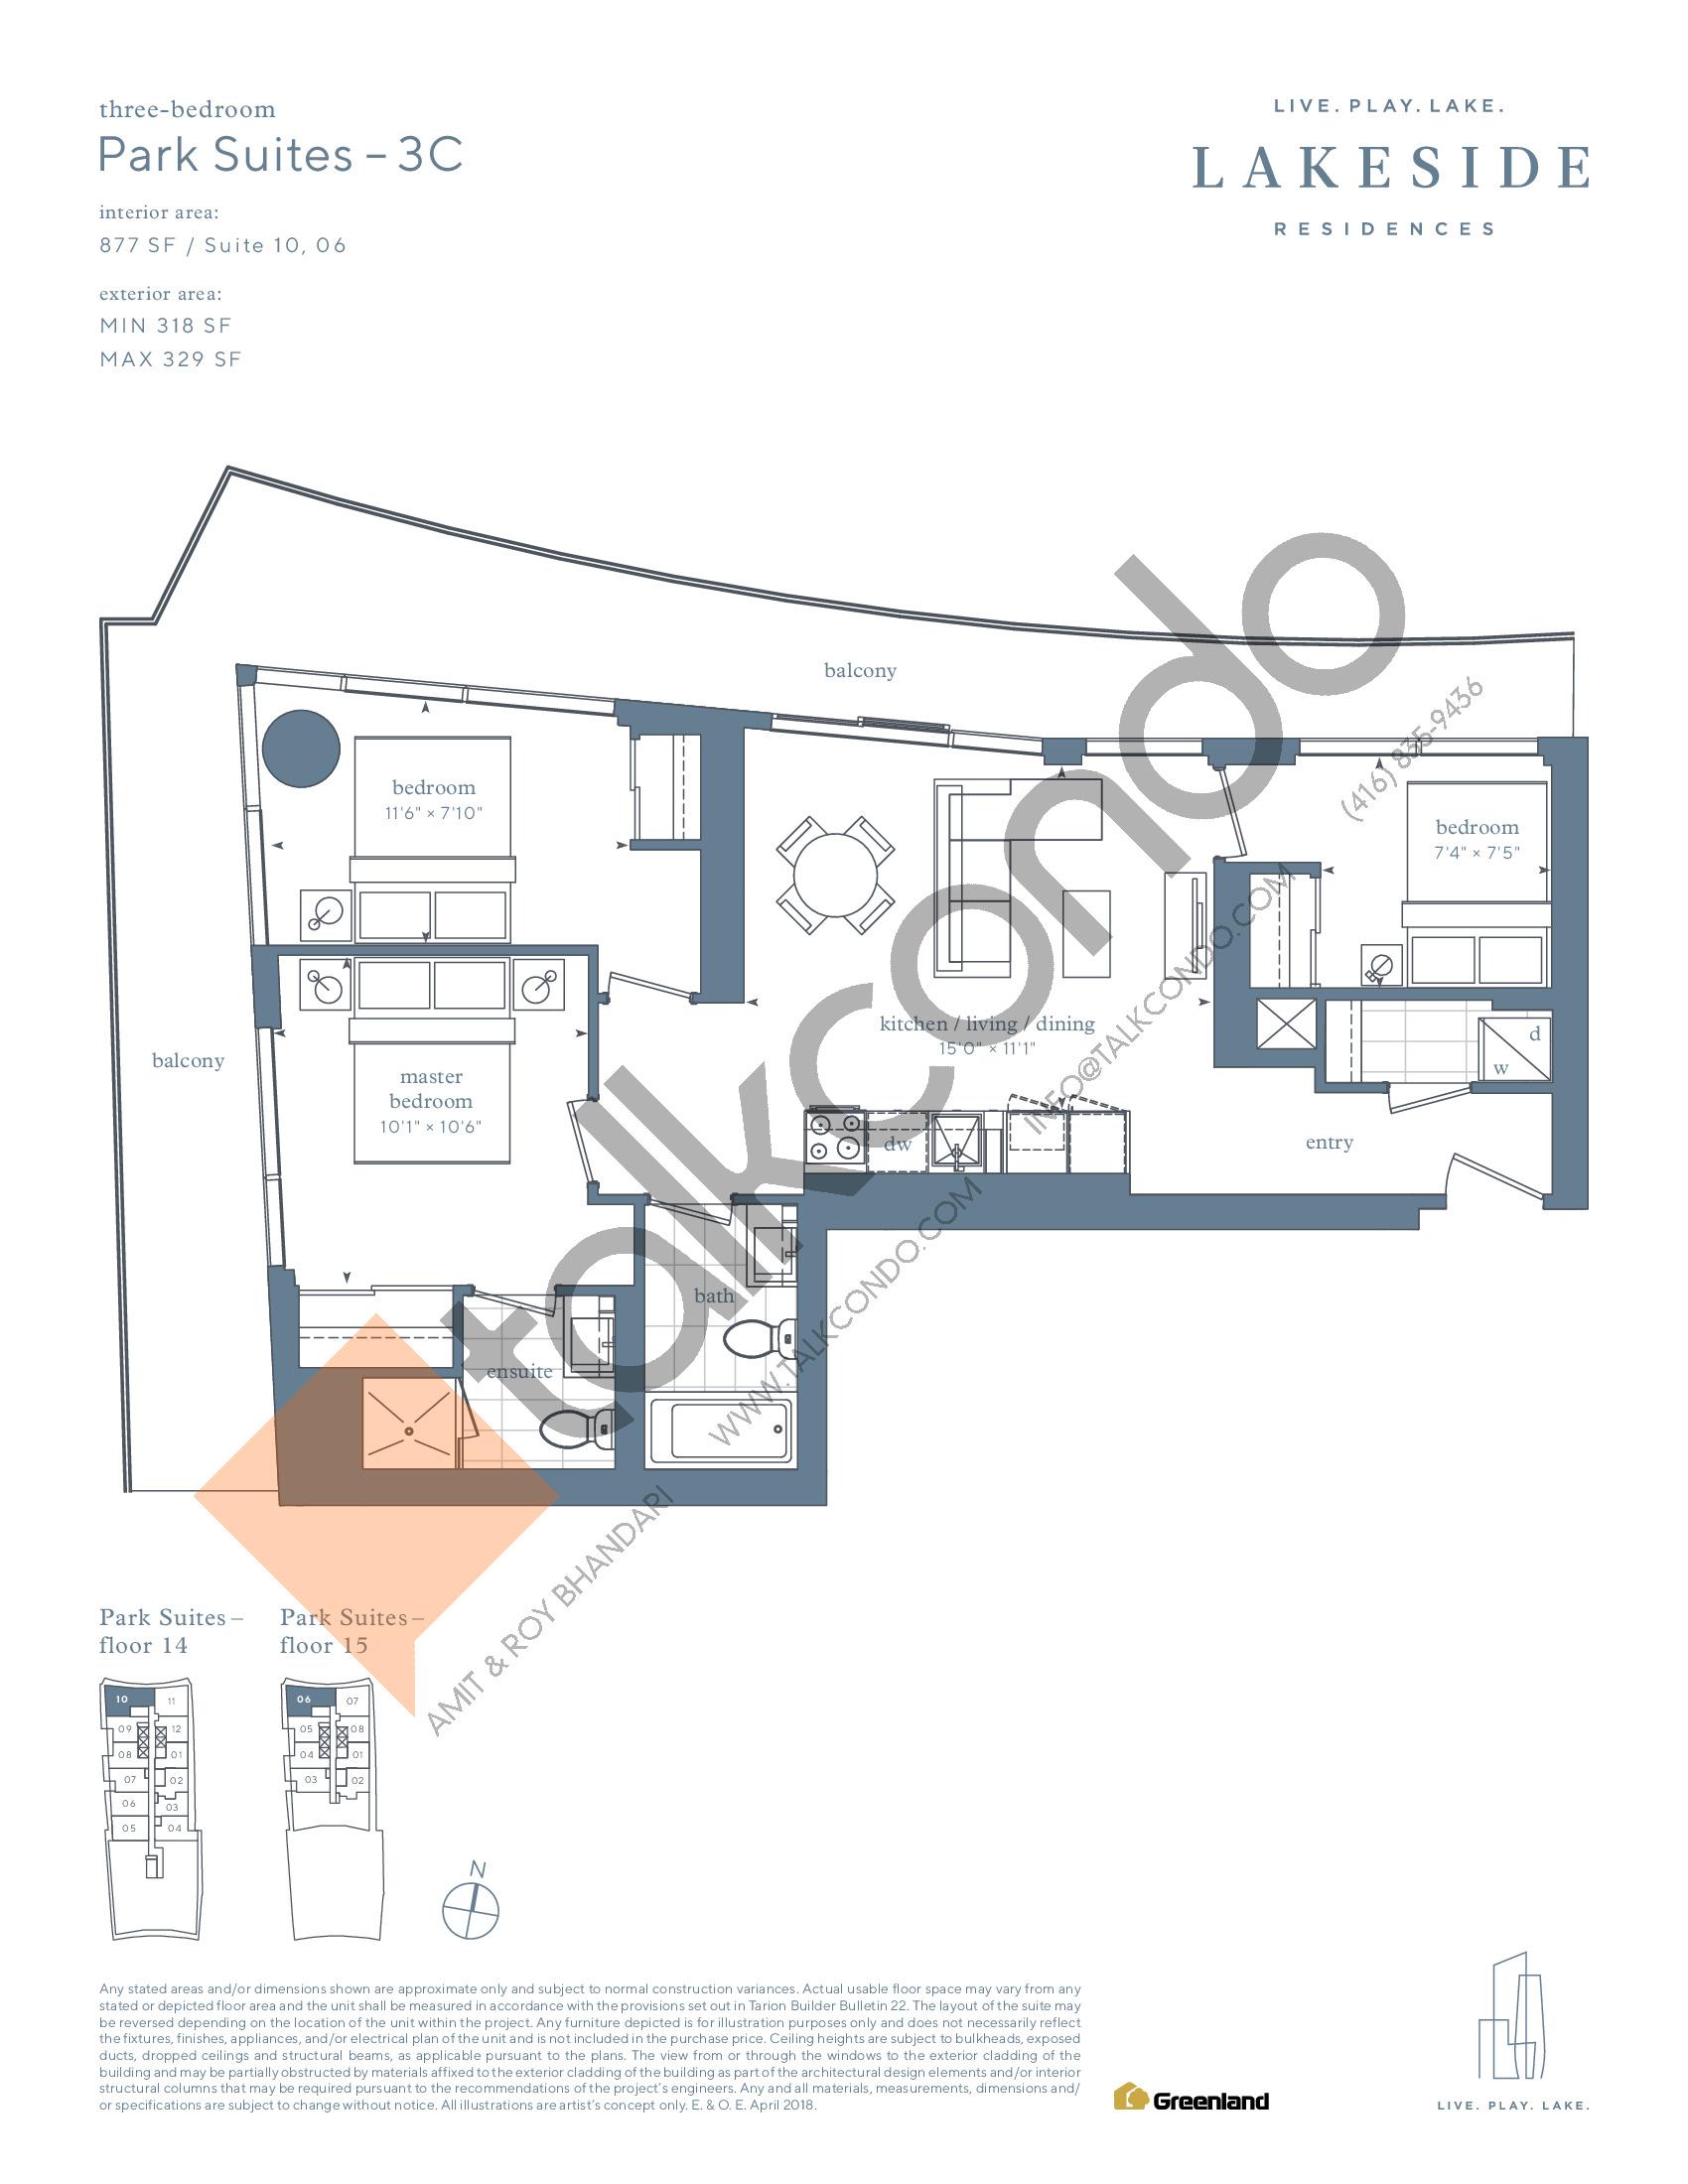 Park Suites - 3C Floor Plan at Lakeside Residences - 877 sq.ft